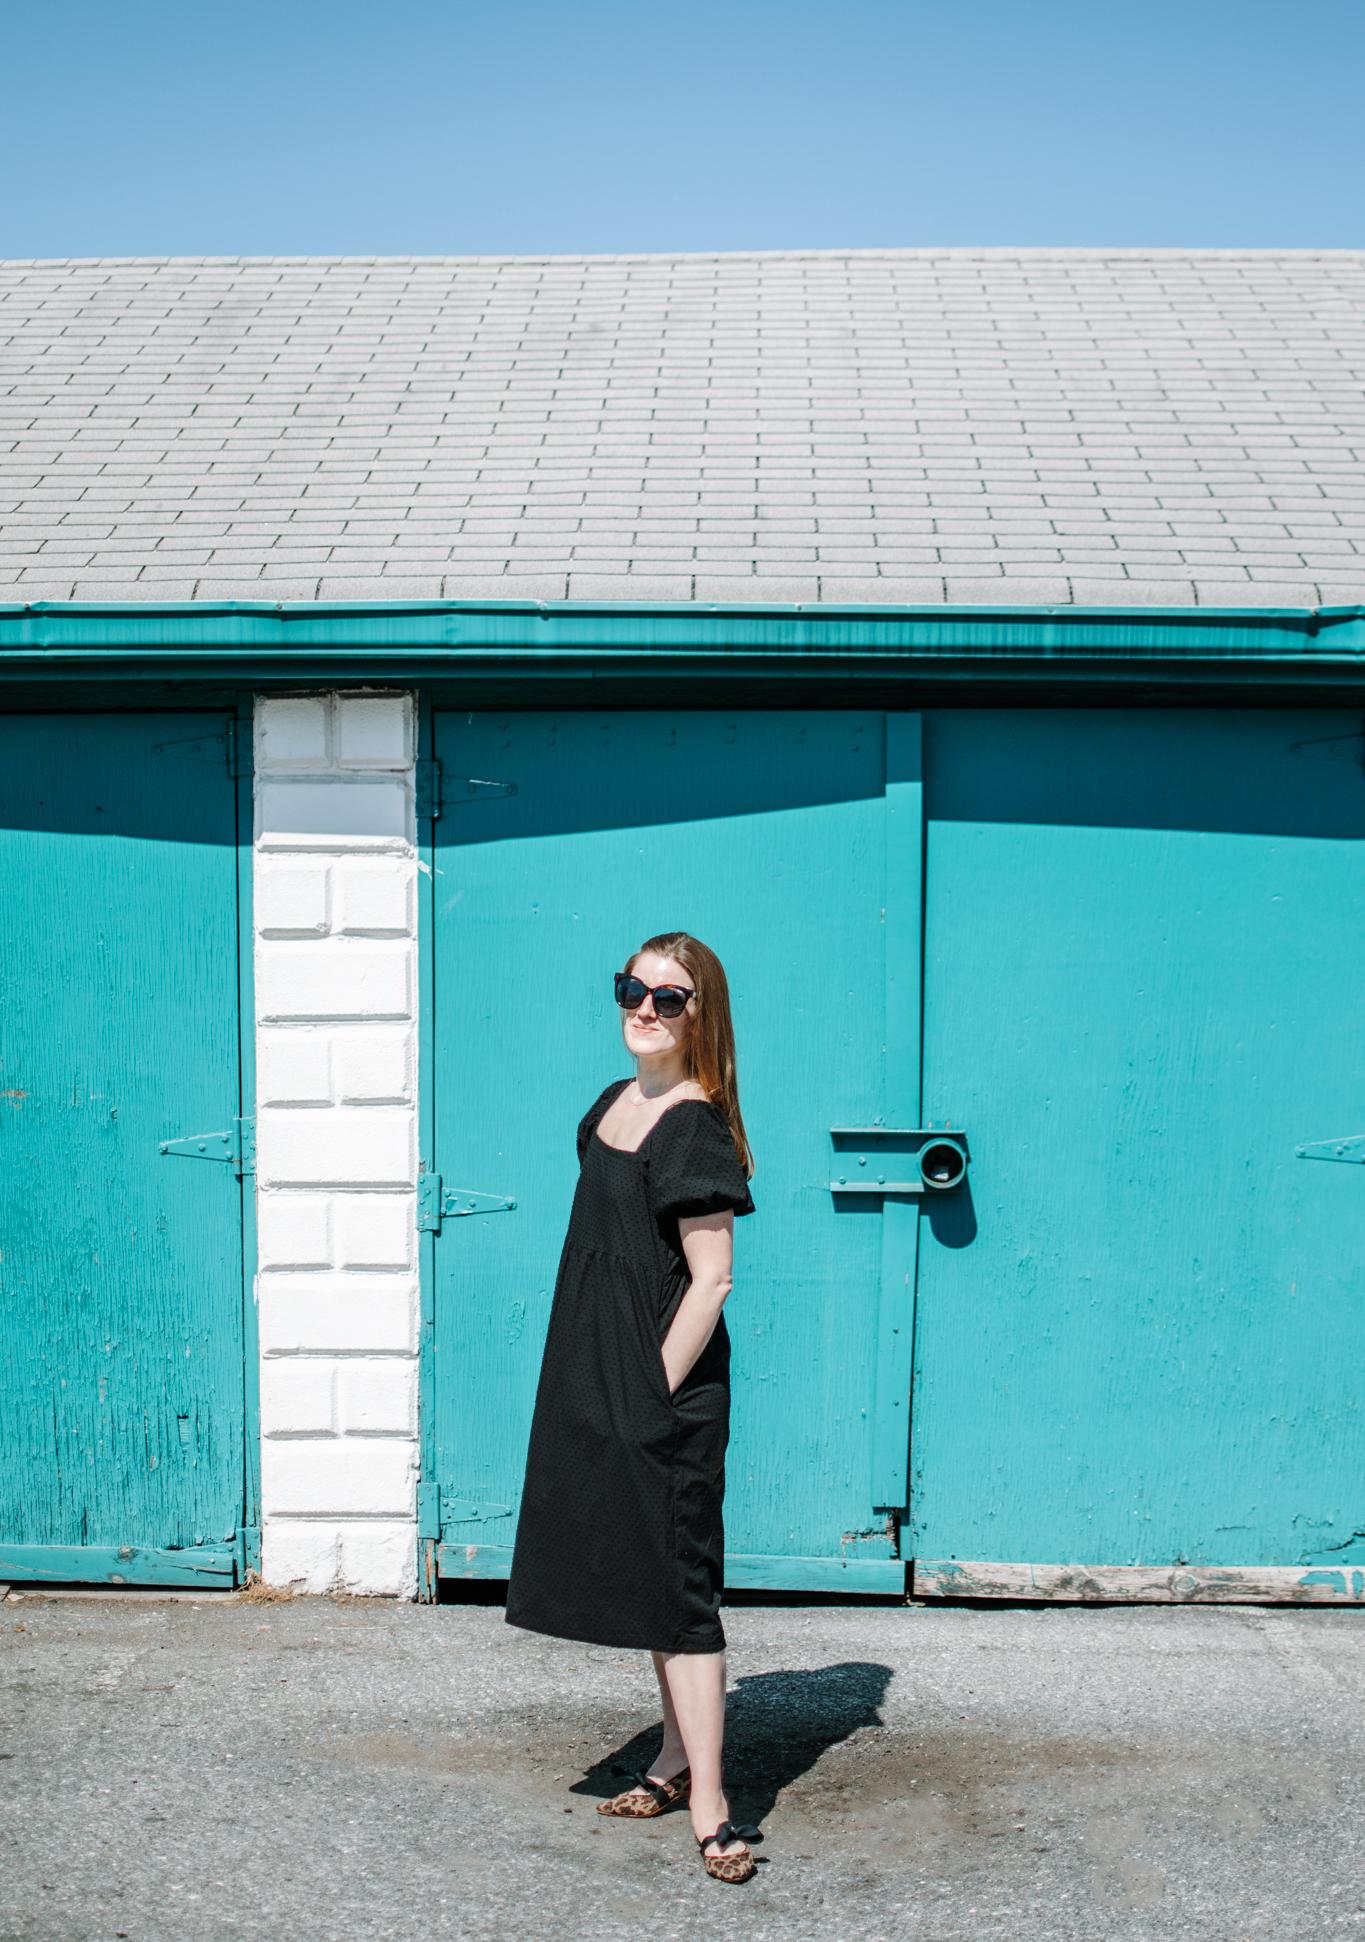 black nap dress dupe - $30 nap dress dupe - black swiss dot dress - target short puff sleeve dress